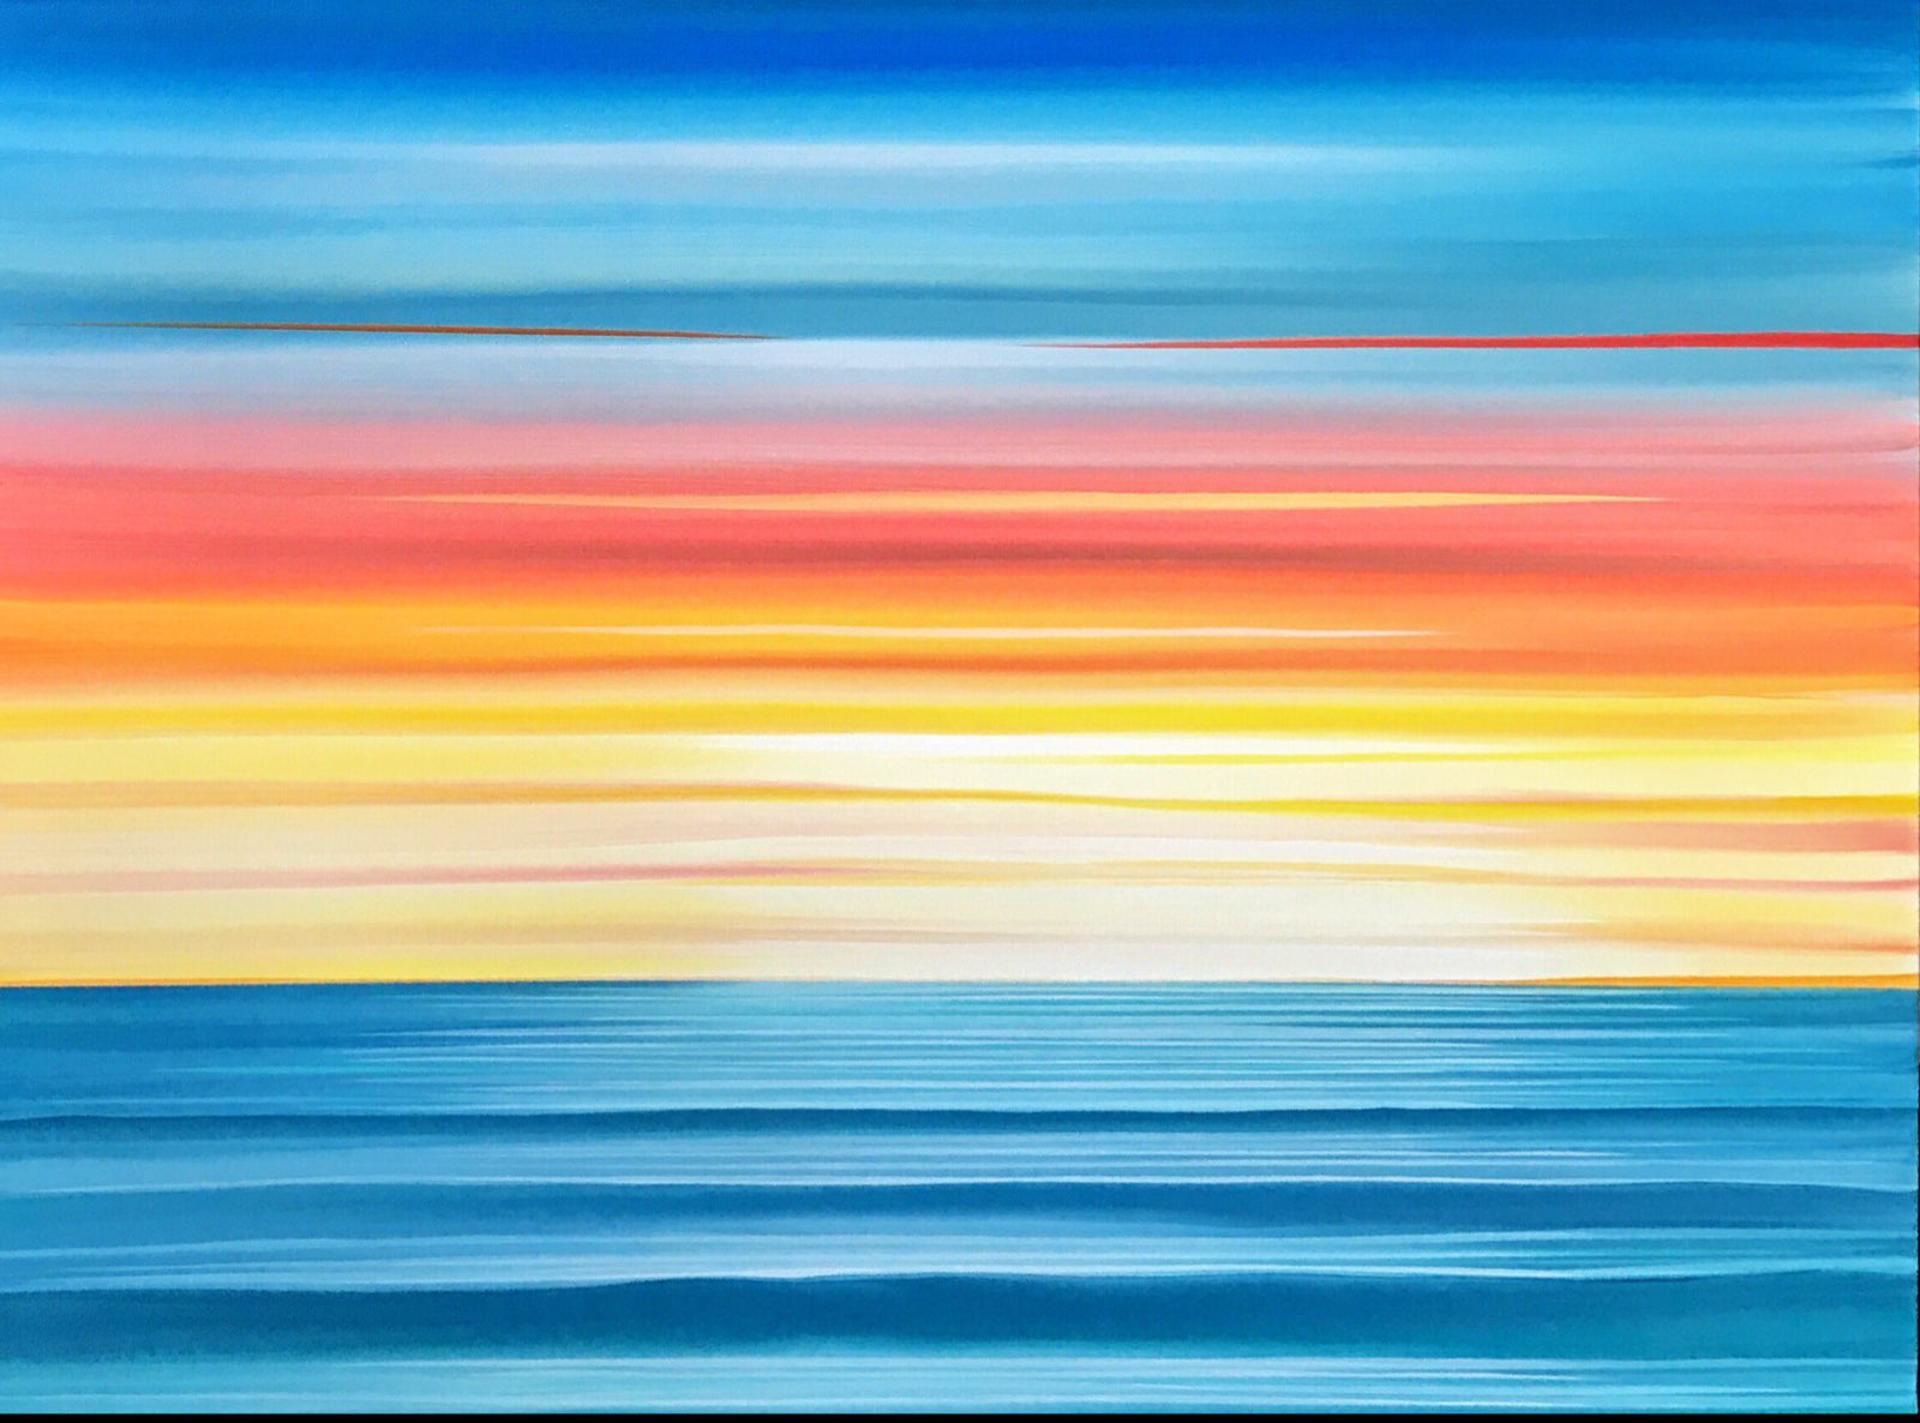 Sea of Passion by Burke Malcom